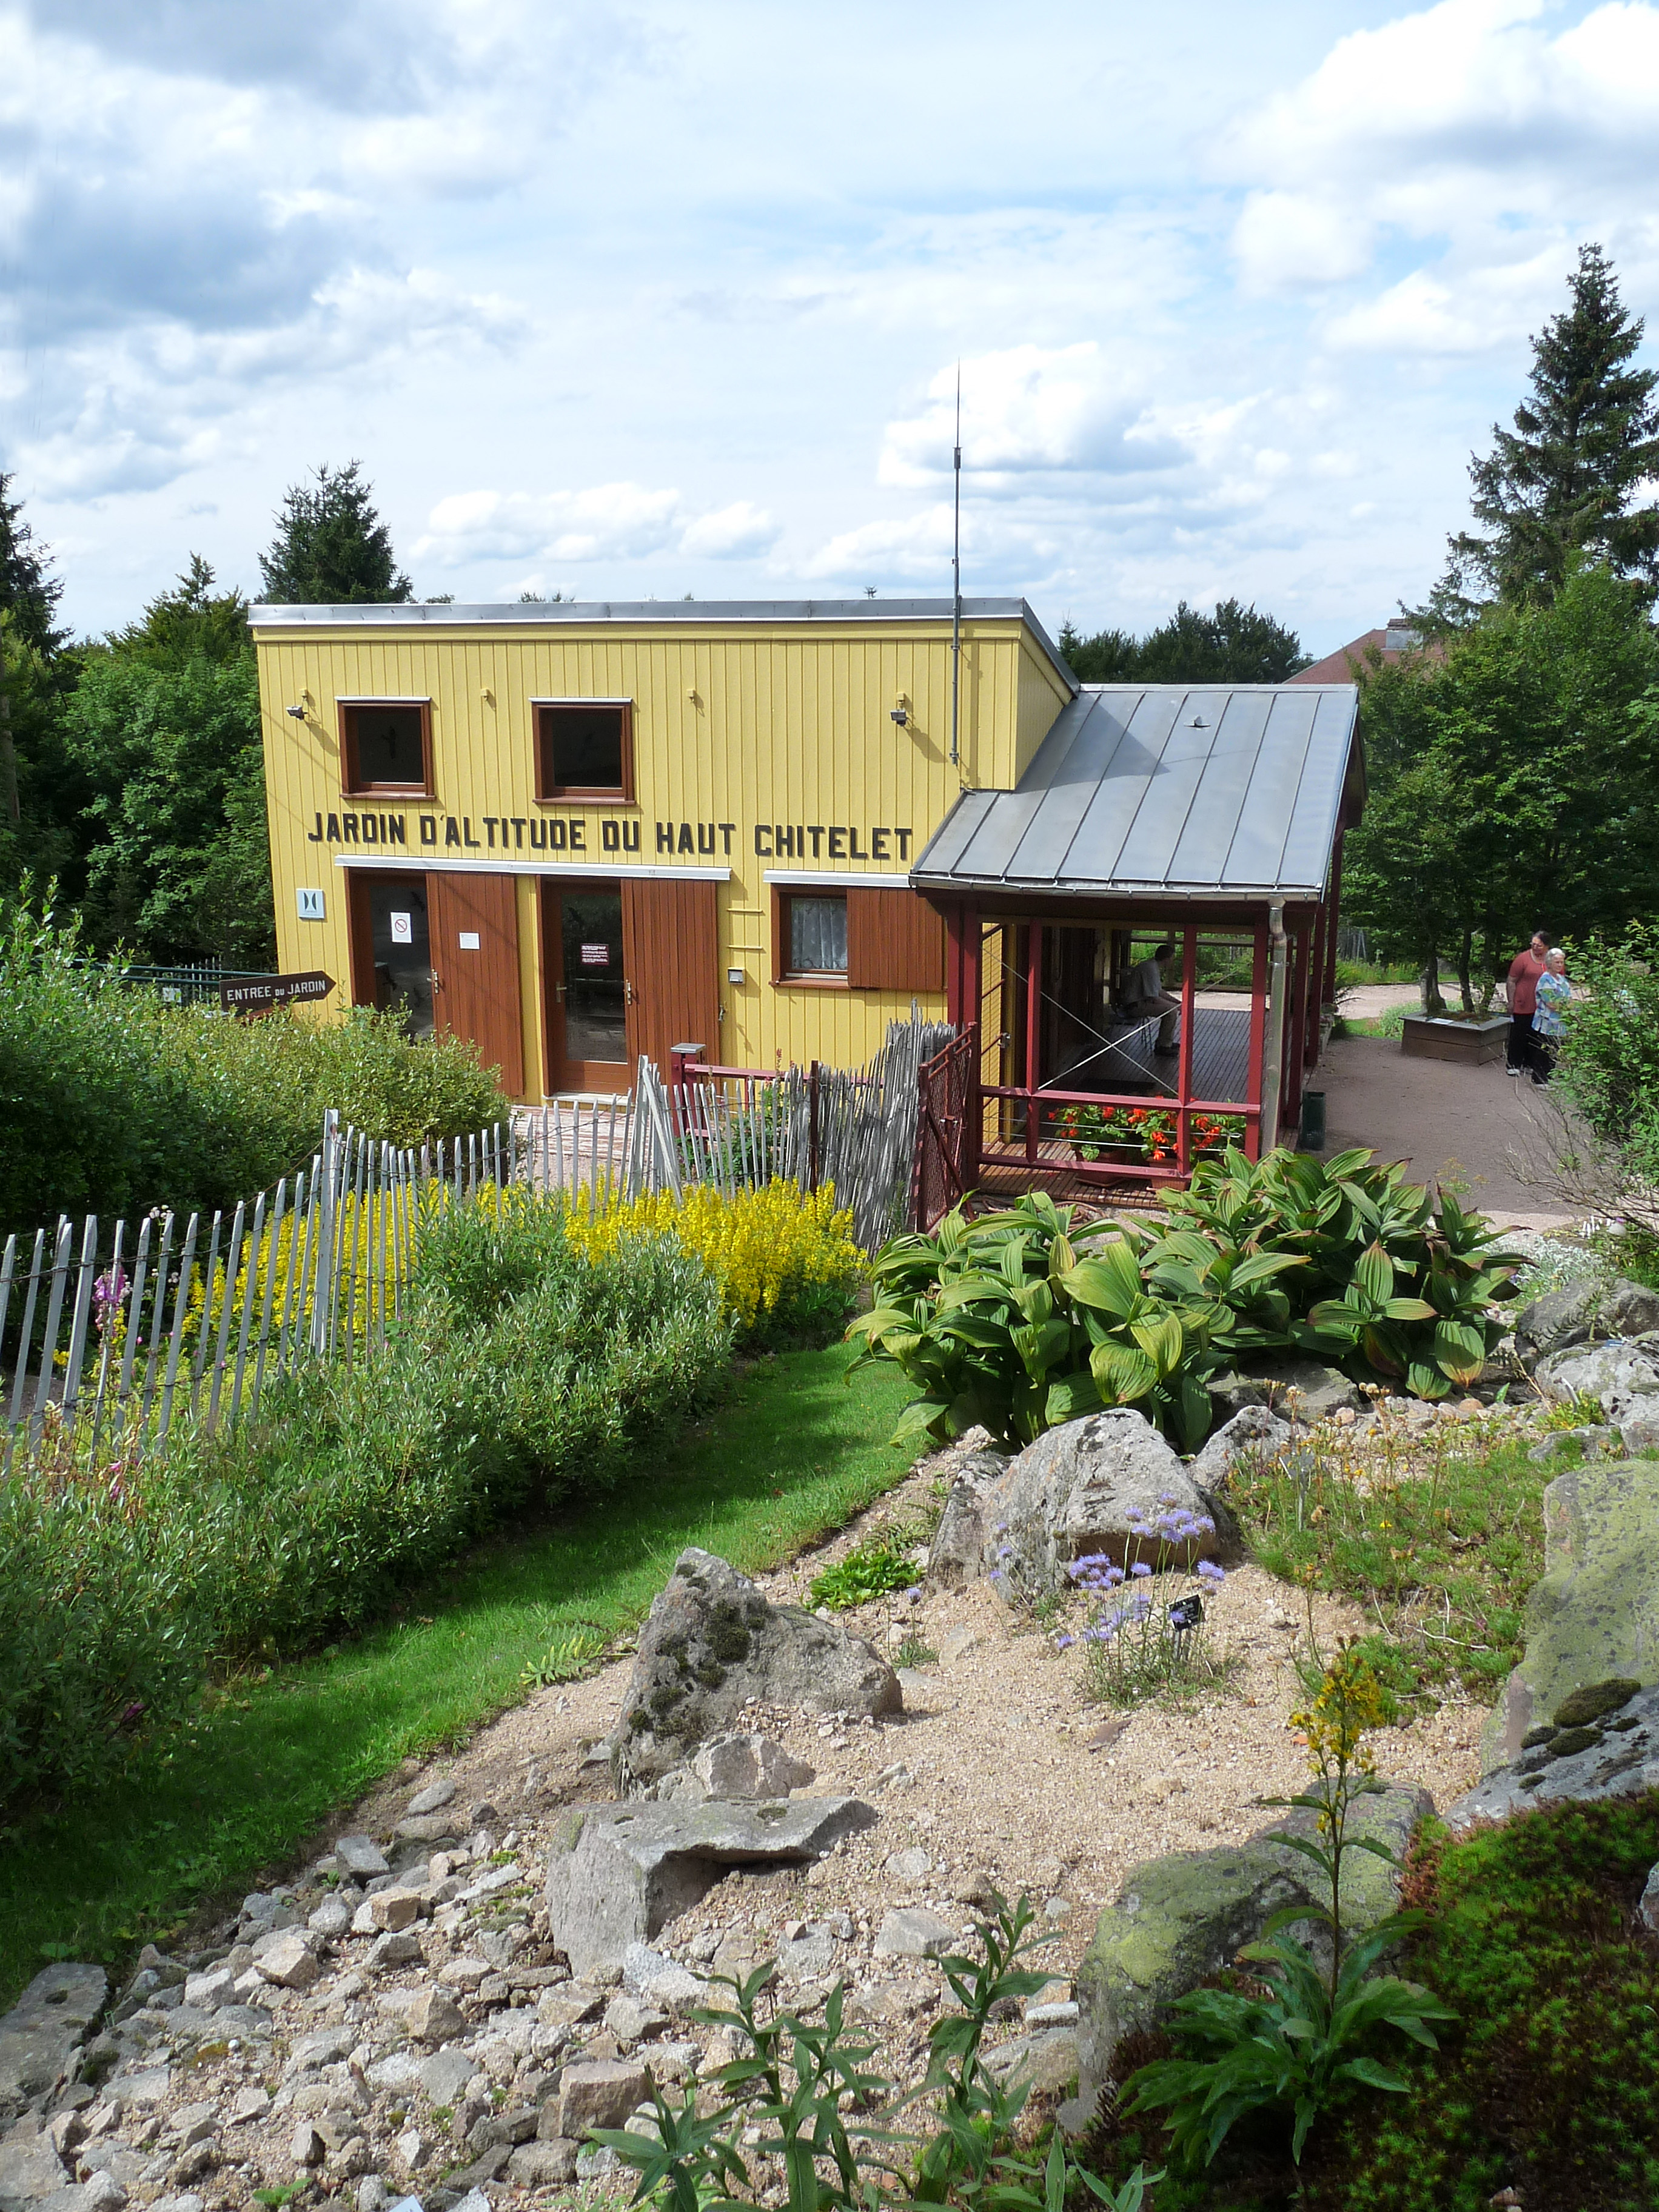 File jardin d 39 altitude du haut chitelet 2 jpg - Jardin d altitude du haut chitelet ...